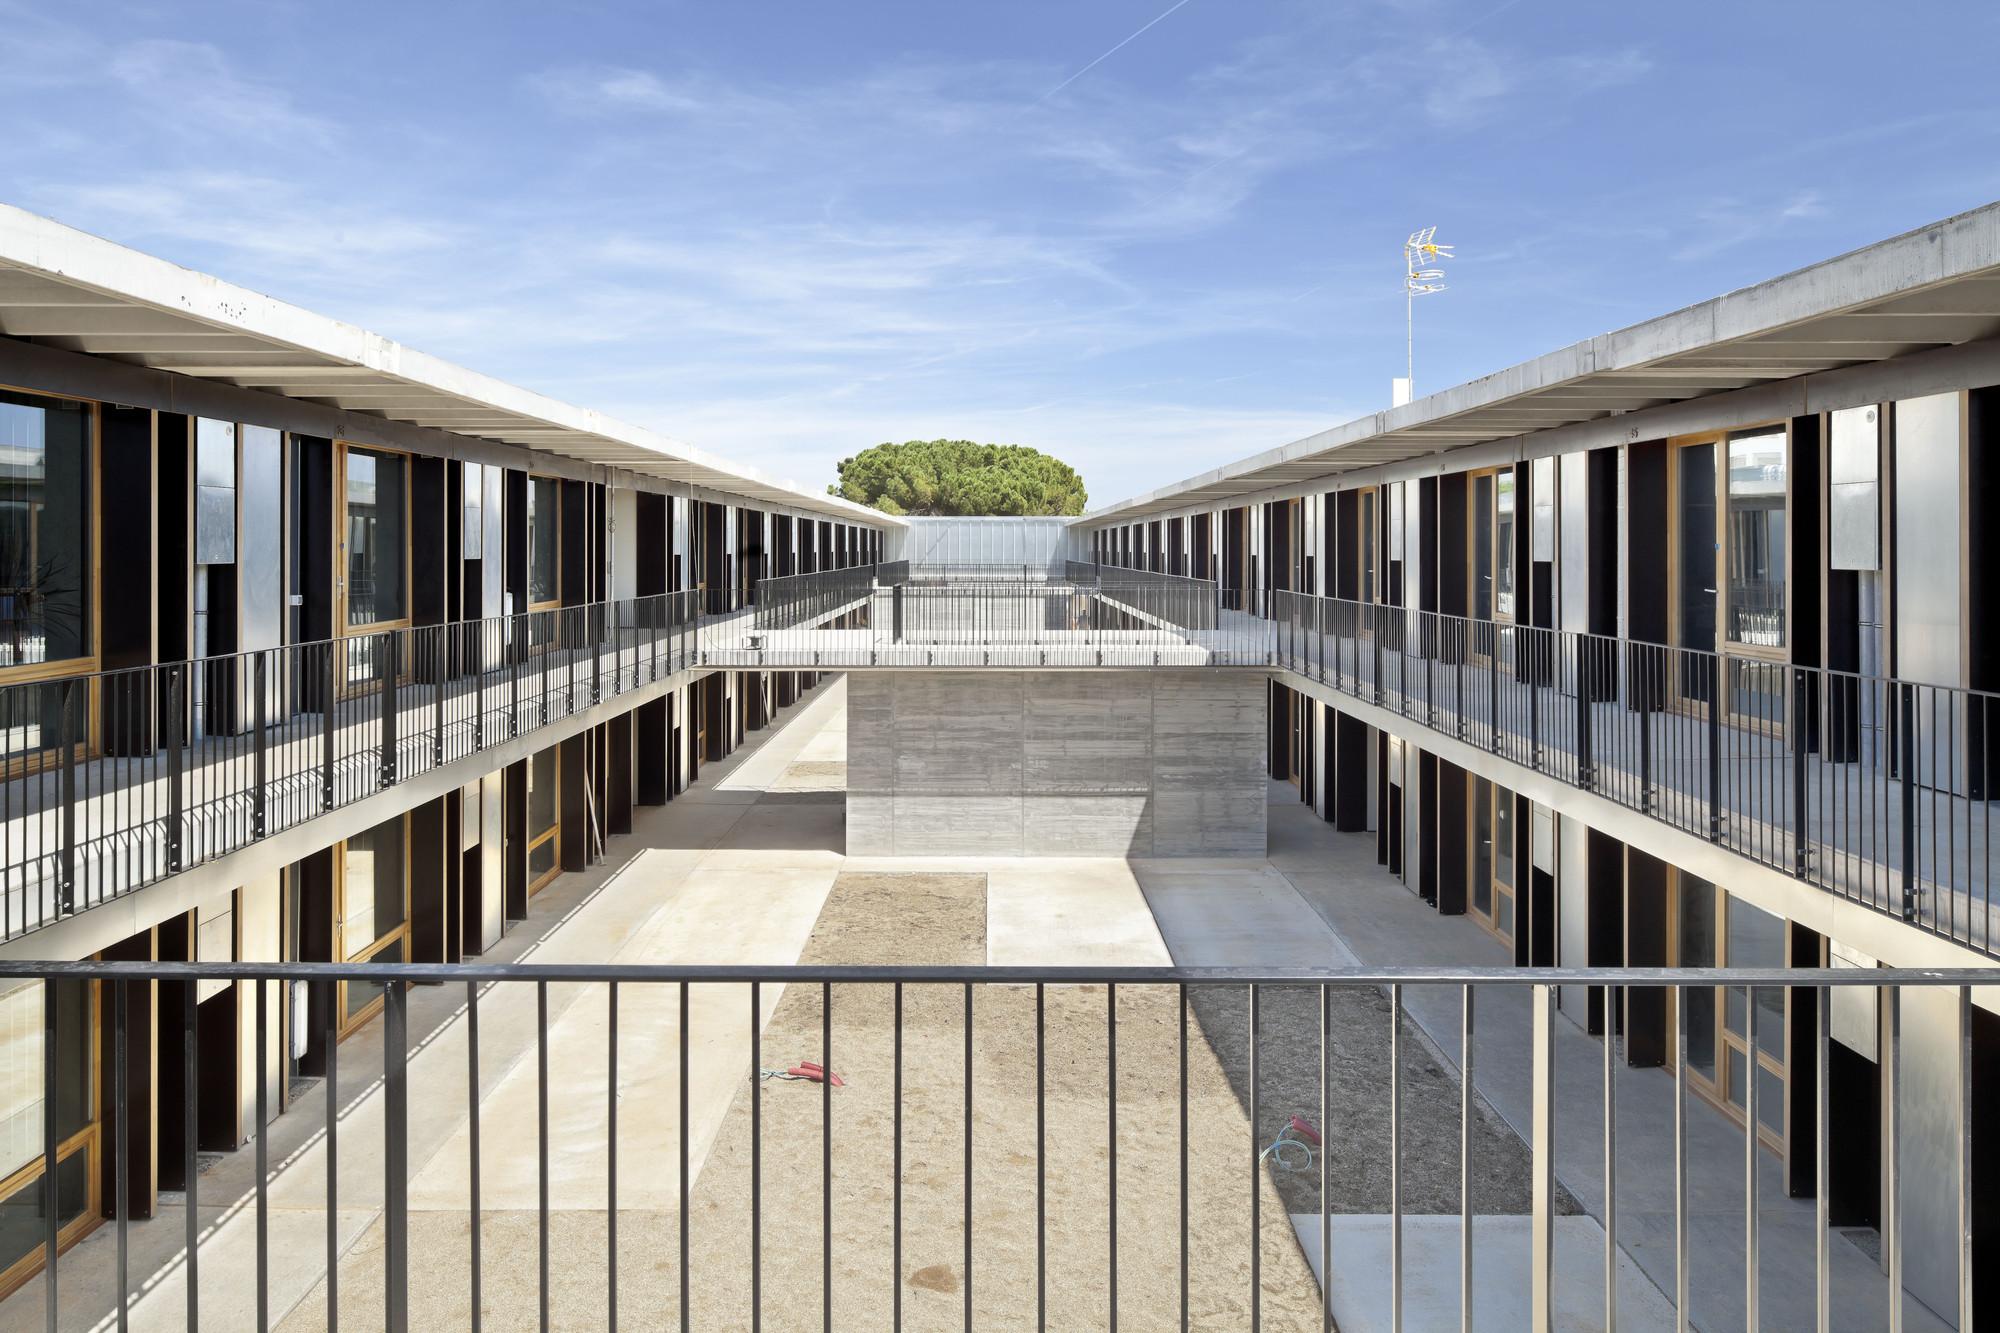 Student Housing (Universitat Politècnica de Catalunya) / H Arquitectes + dataAE, © Adrià Goula